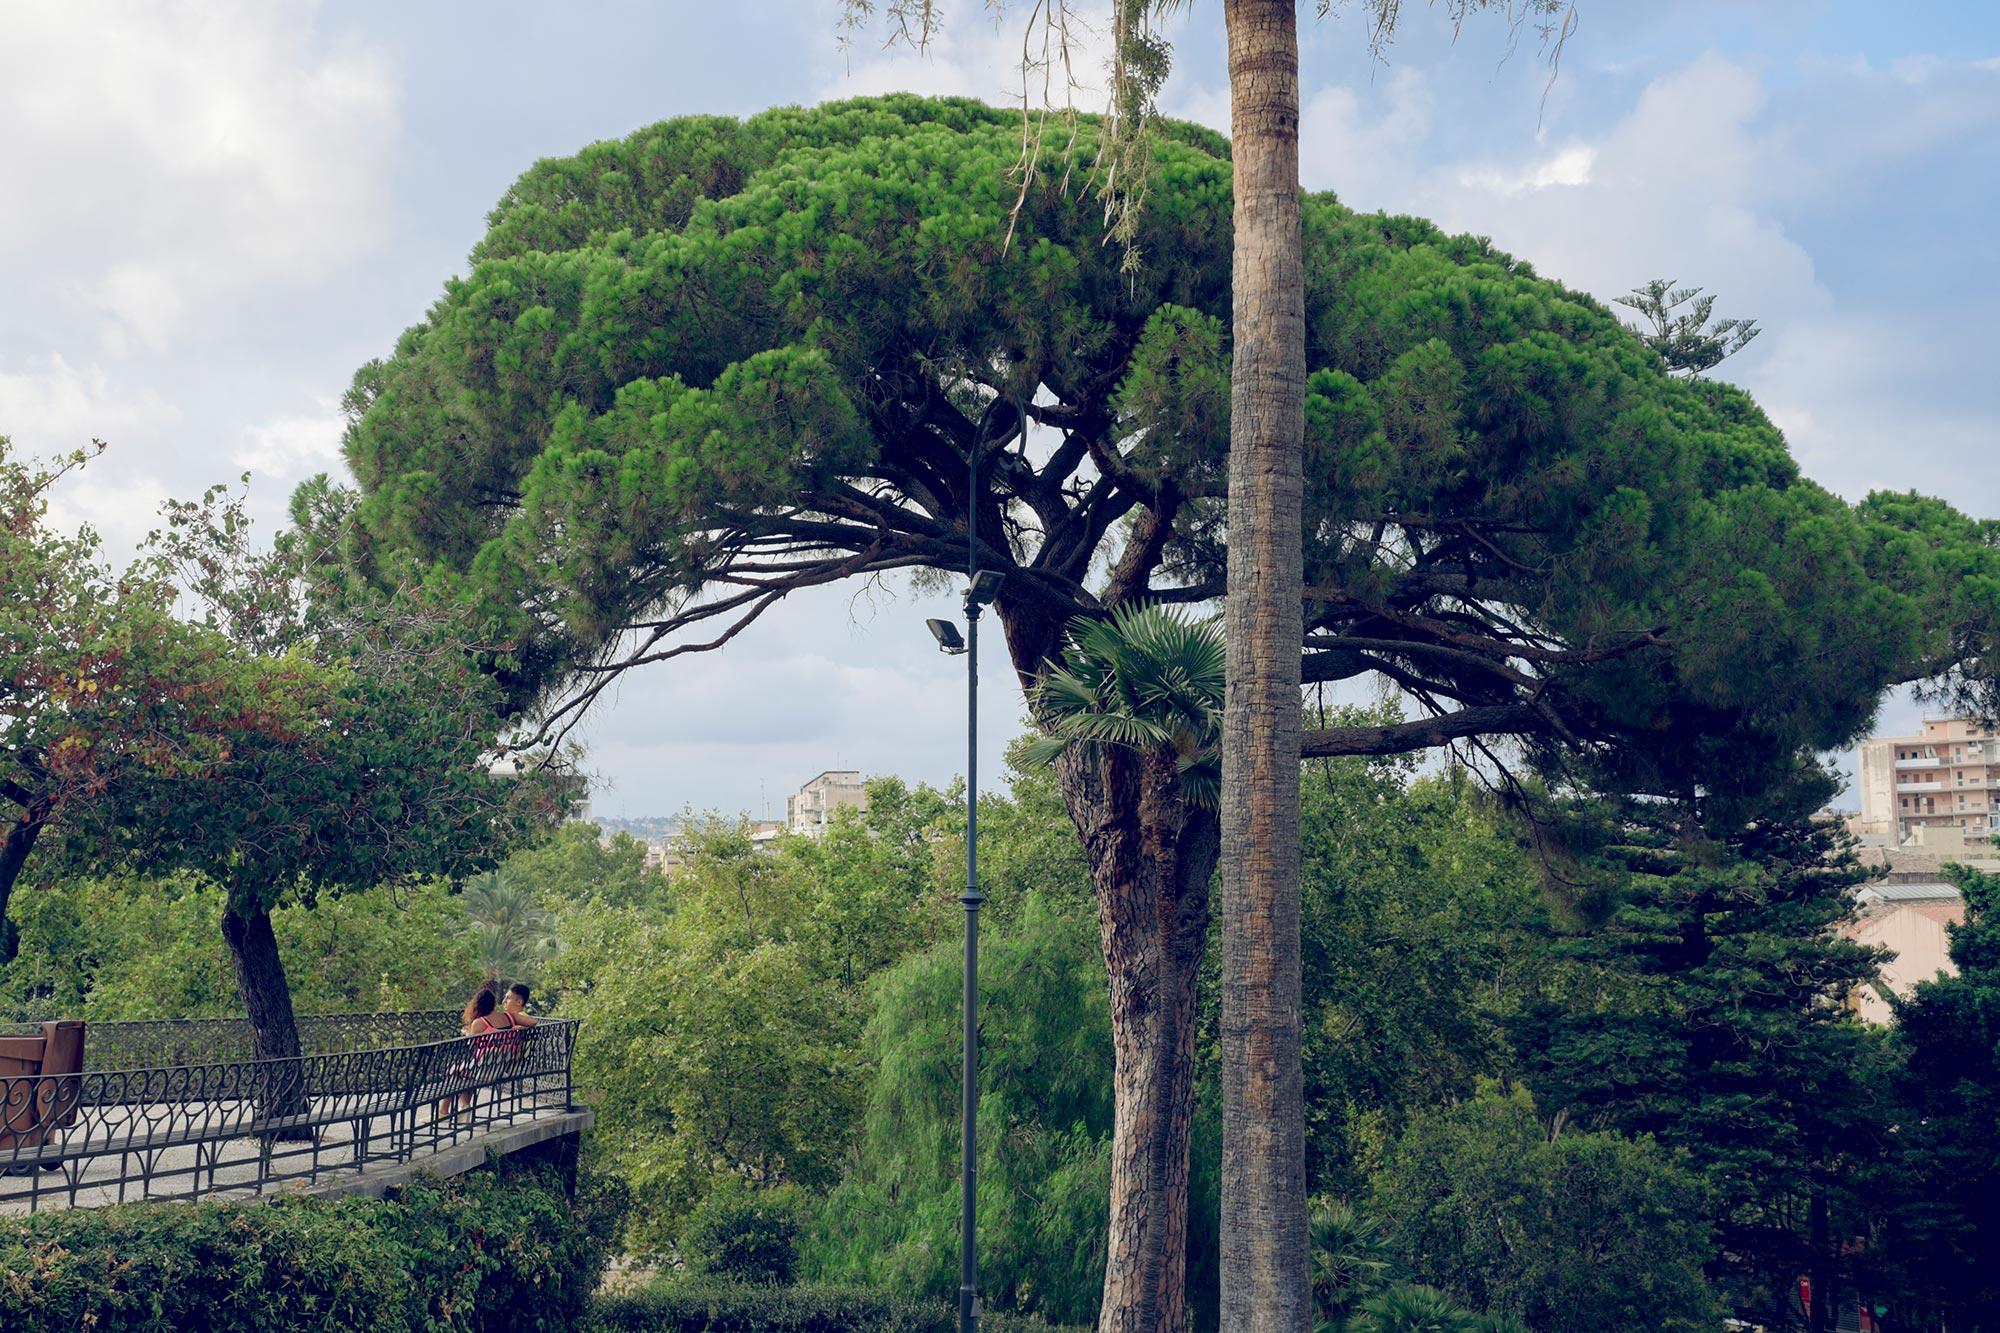 italy-sicilia-catania-giardino-bellini-tree